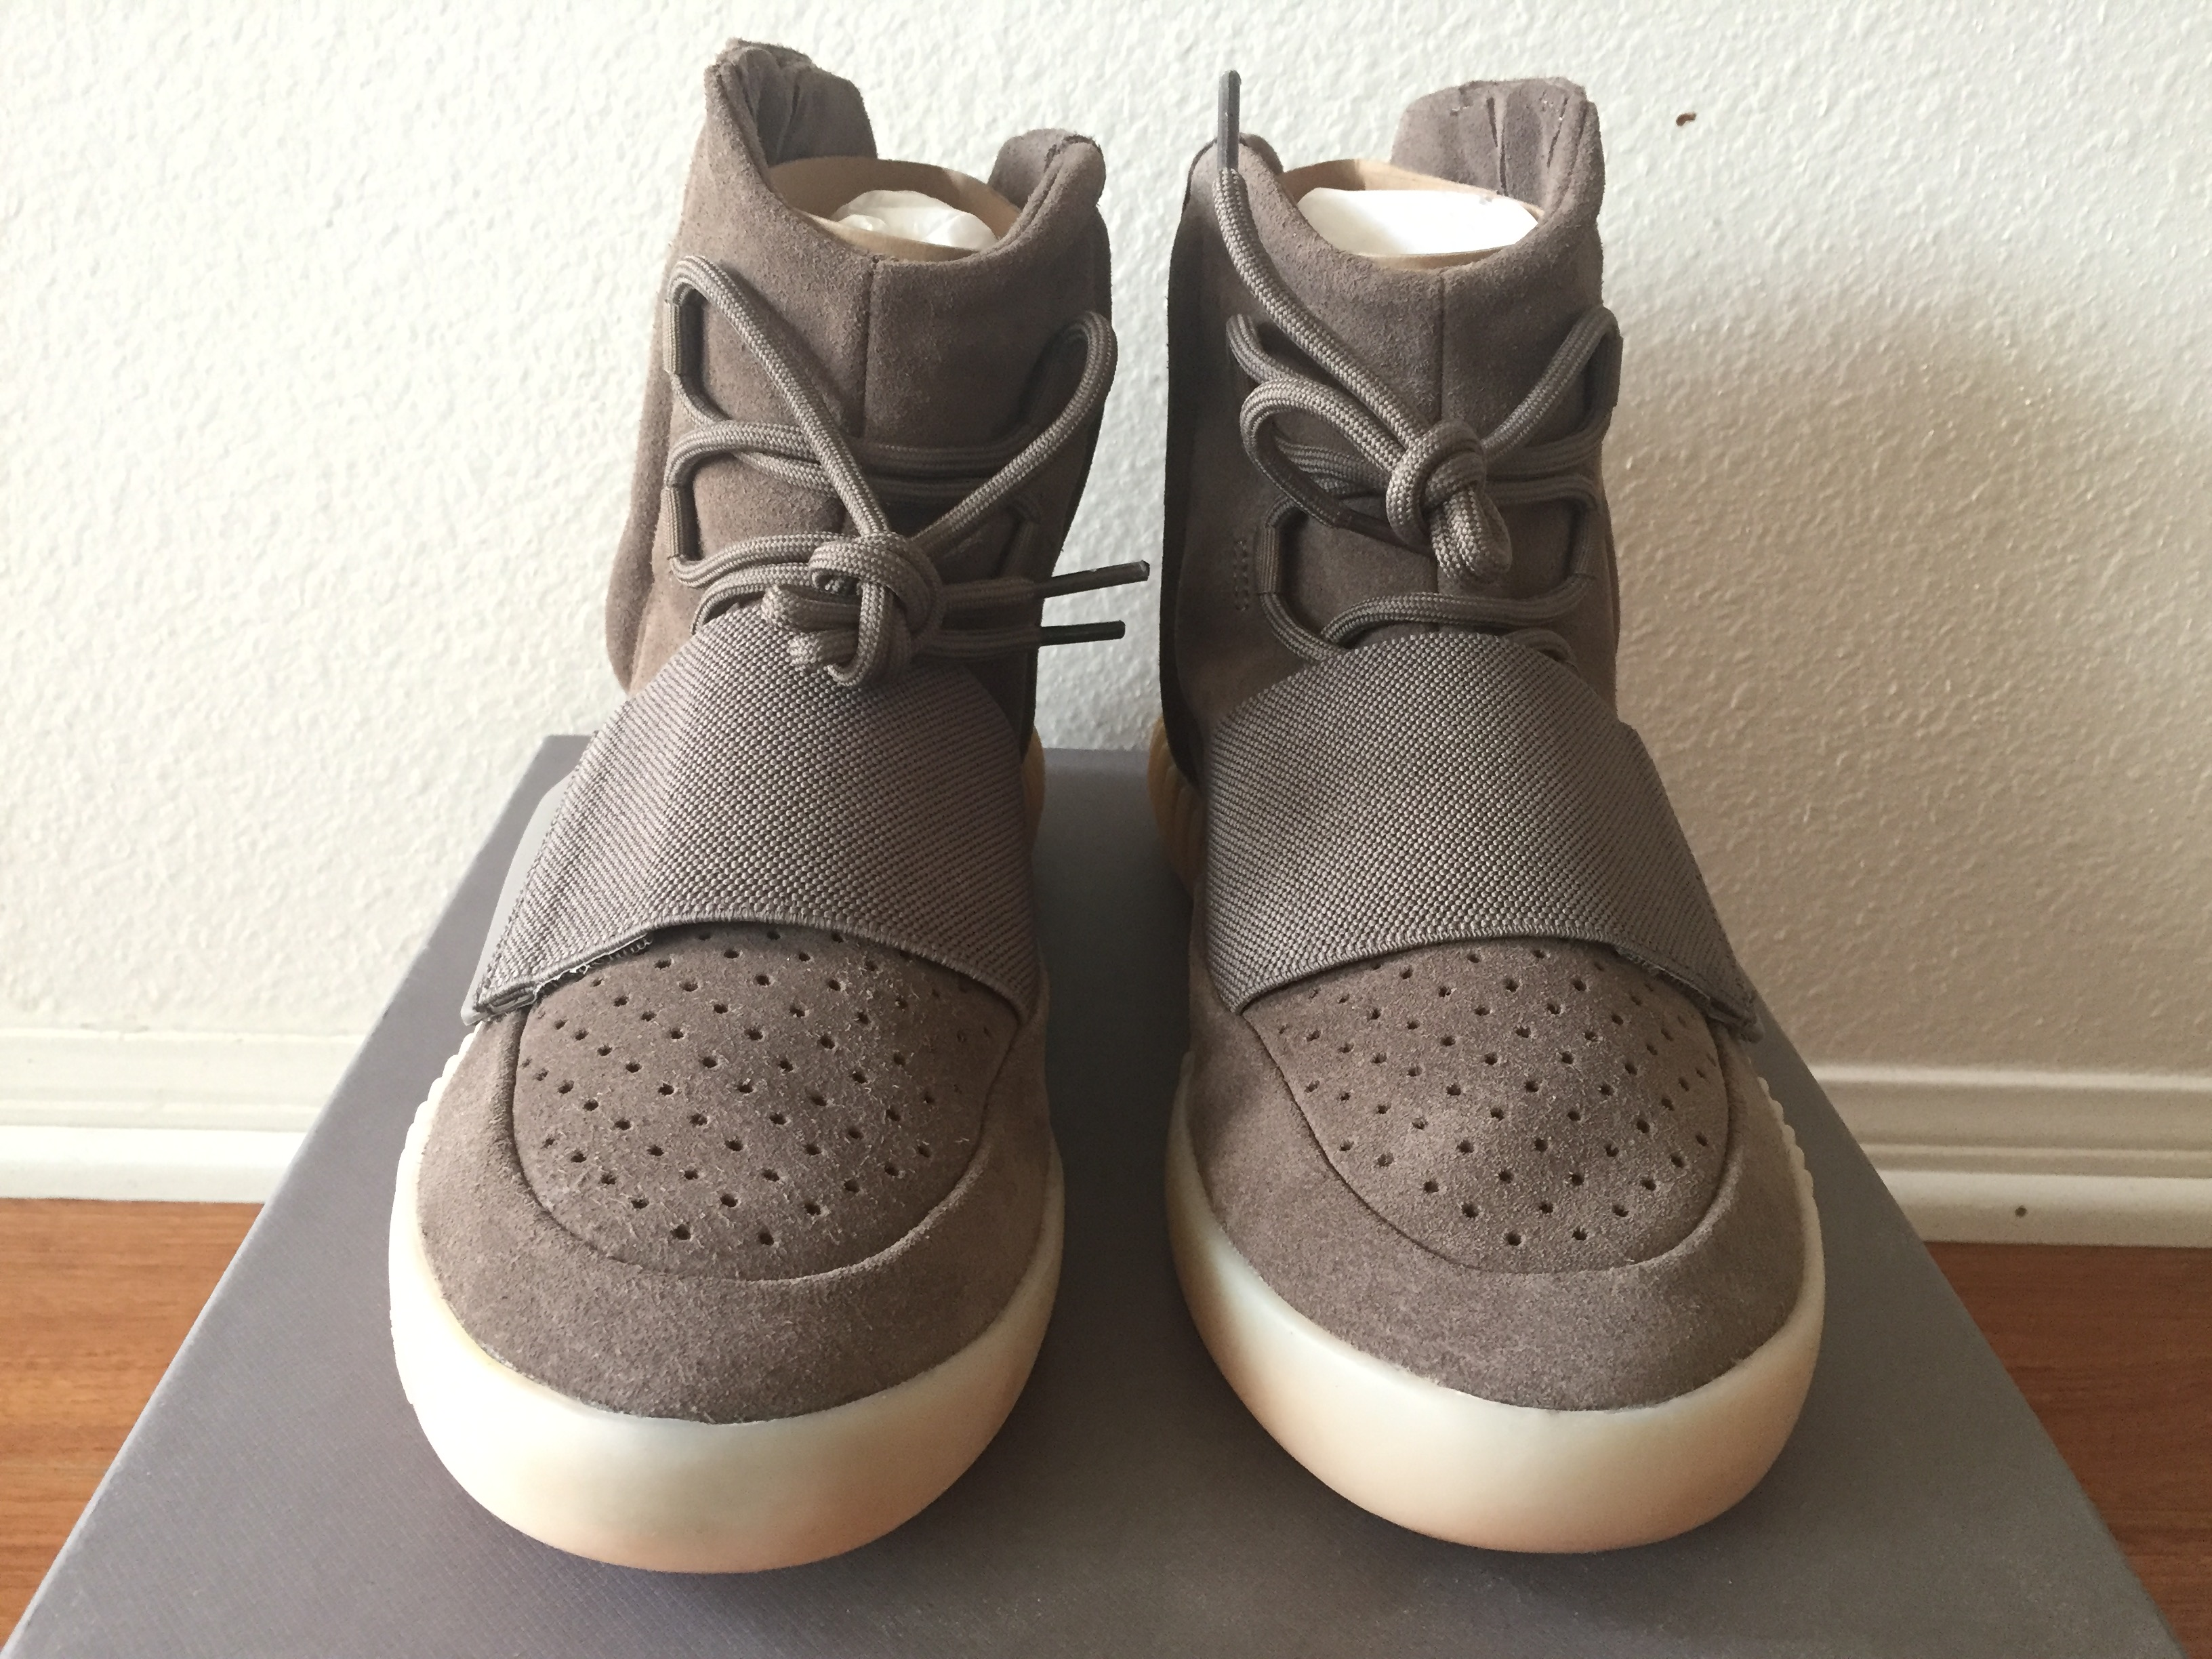 Adidas Yeezy Boost 750 1